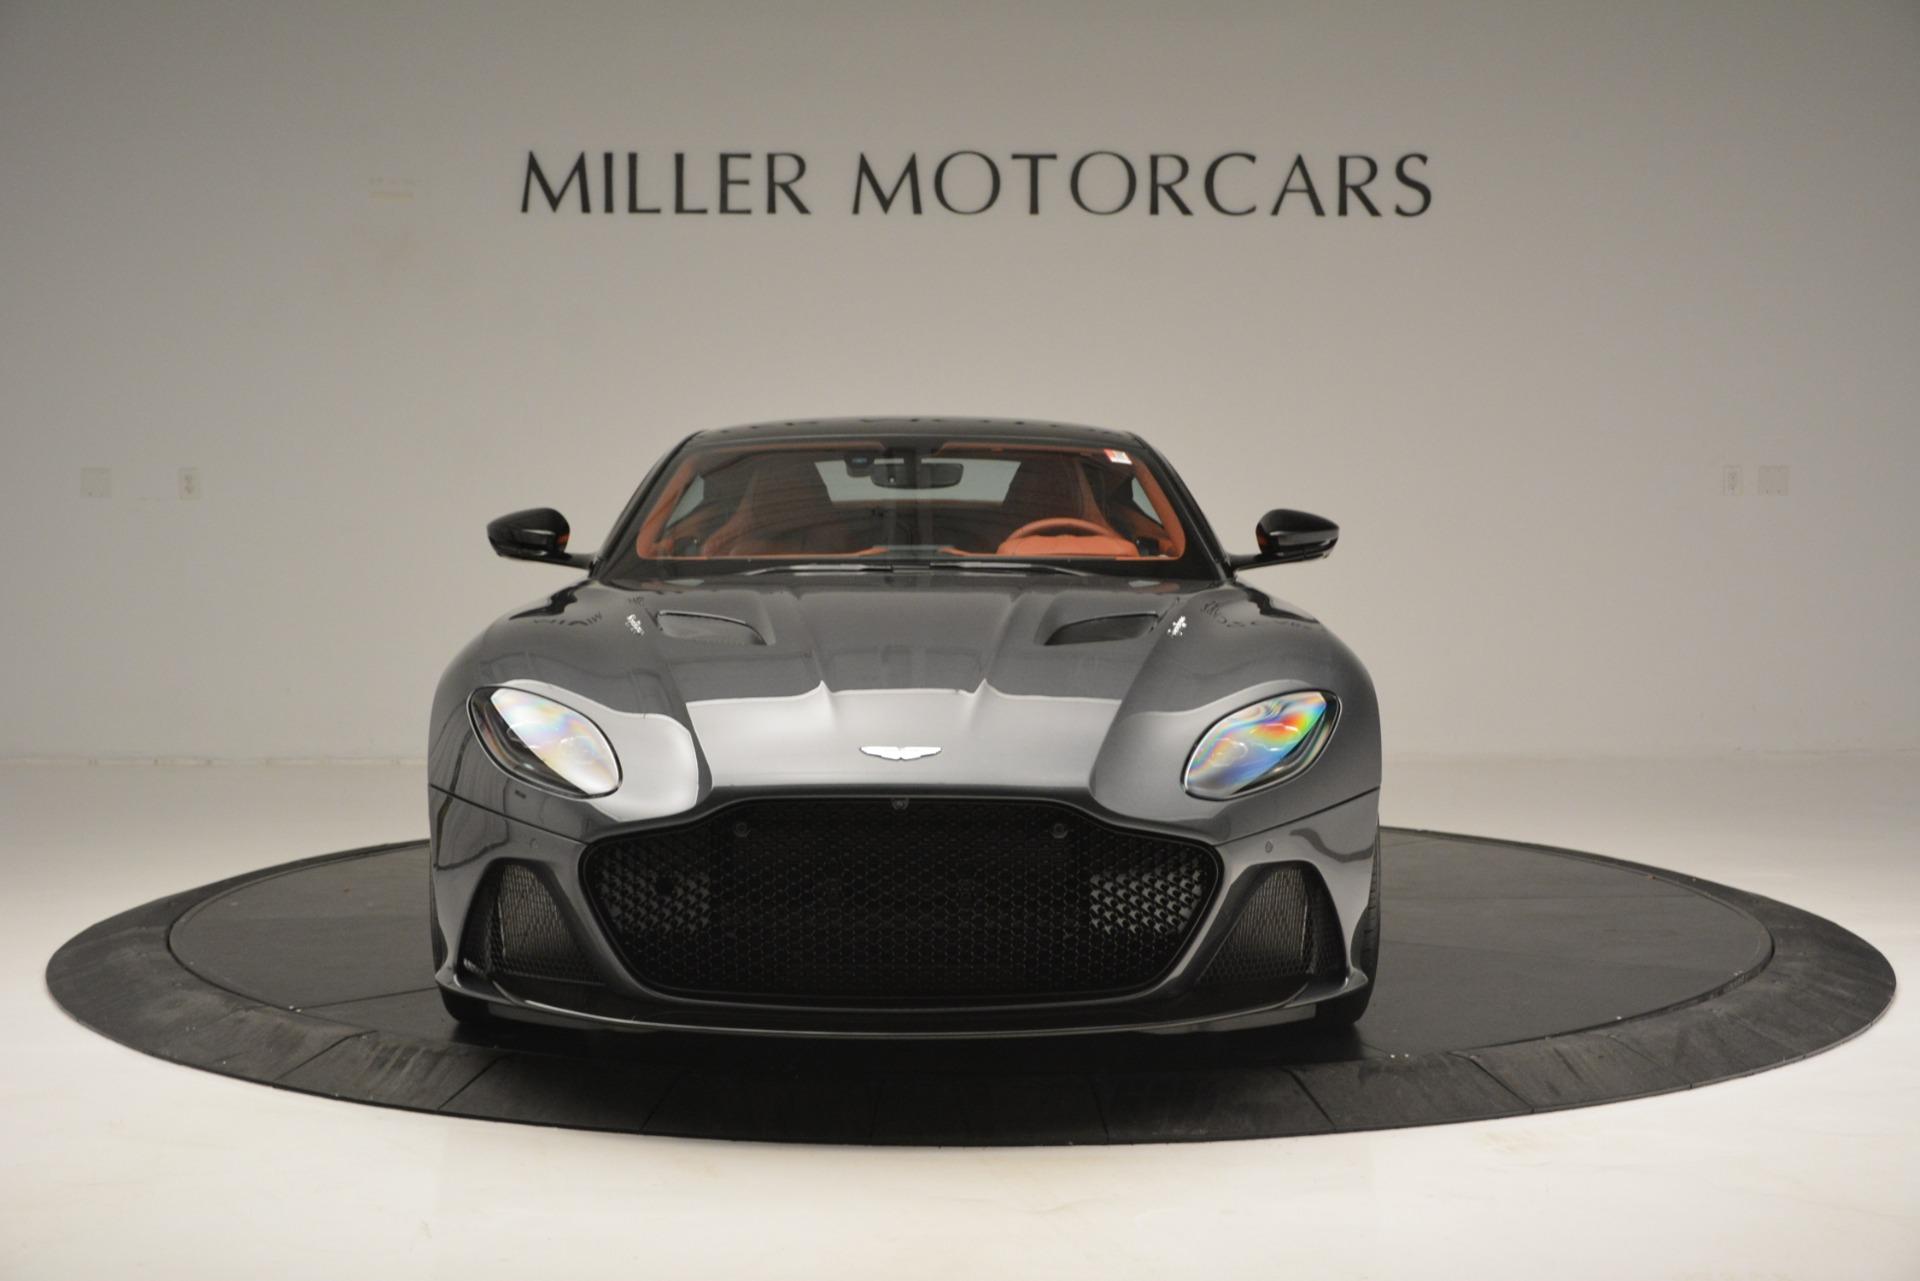 New 2019 Aston Martin DBS Superleggera For Sale In Greenwich, CT. Alfa Romeo of Greenwich, A1336 2827_p12